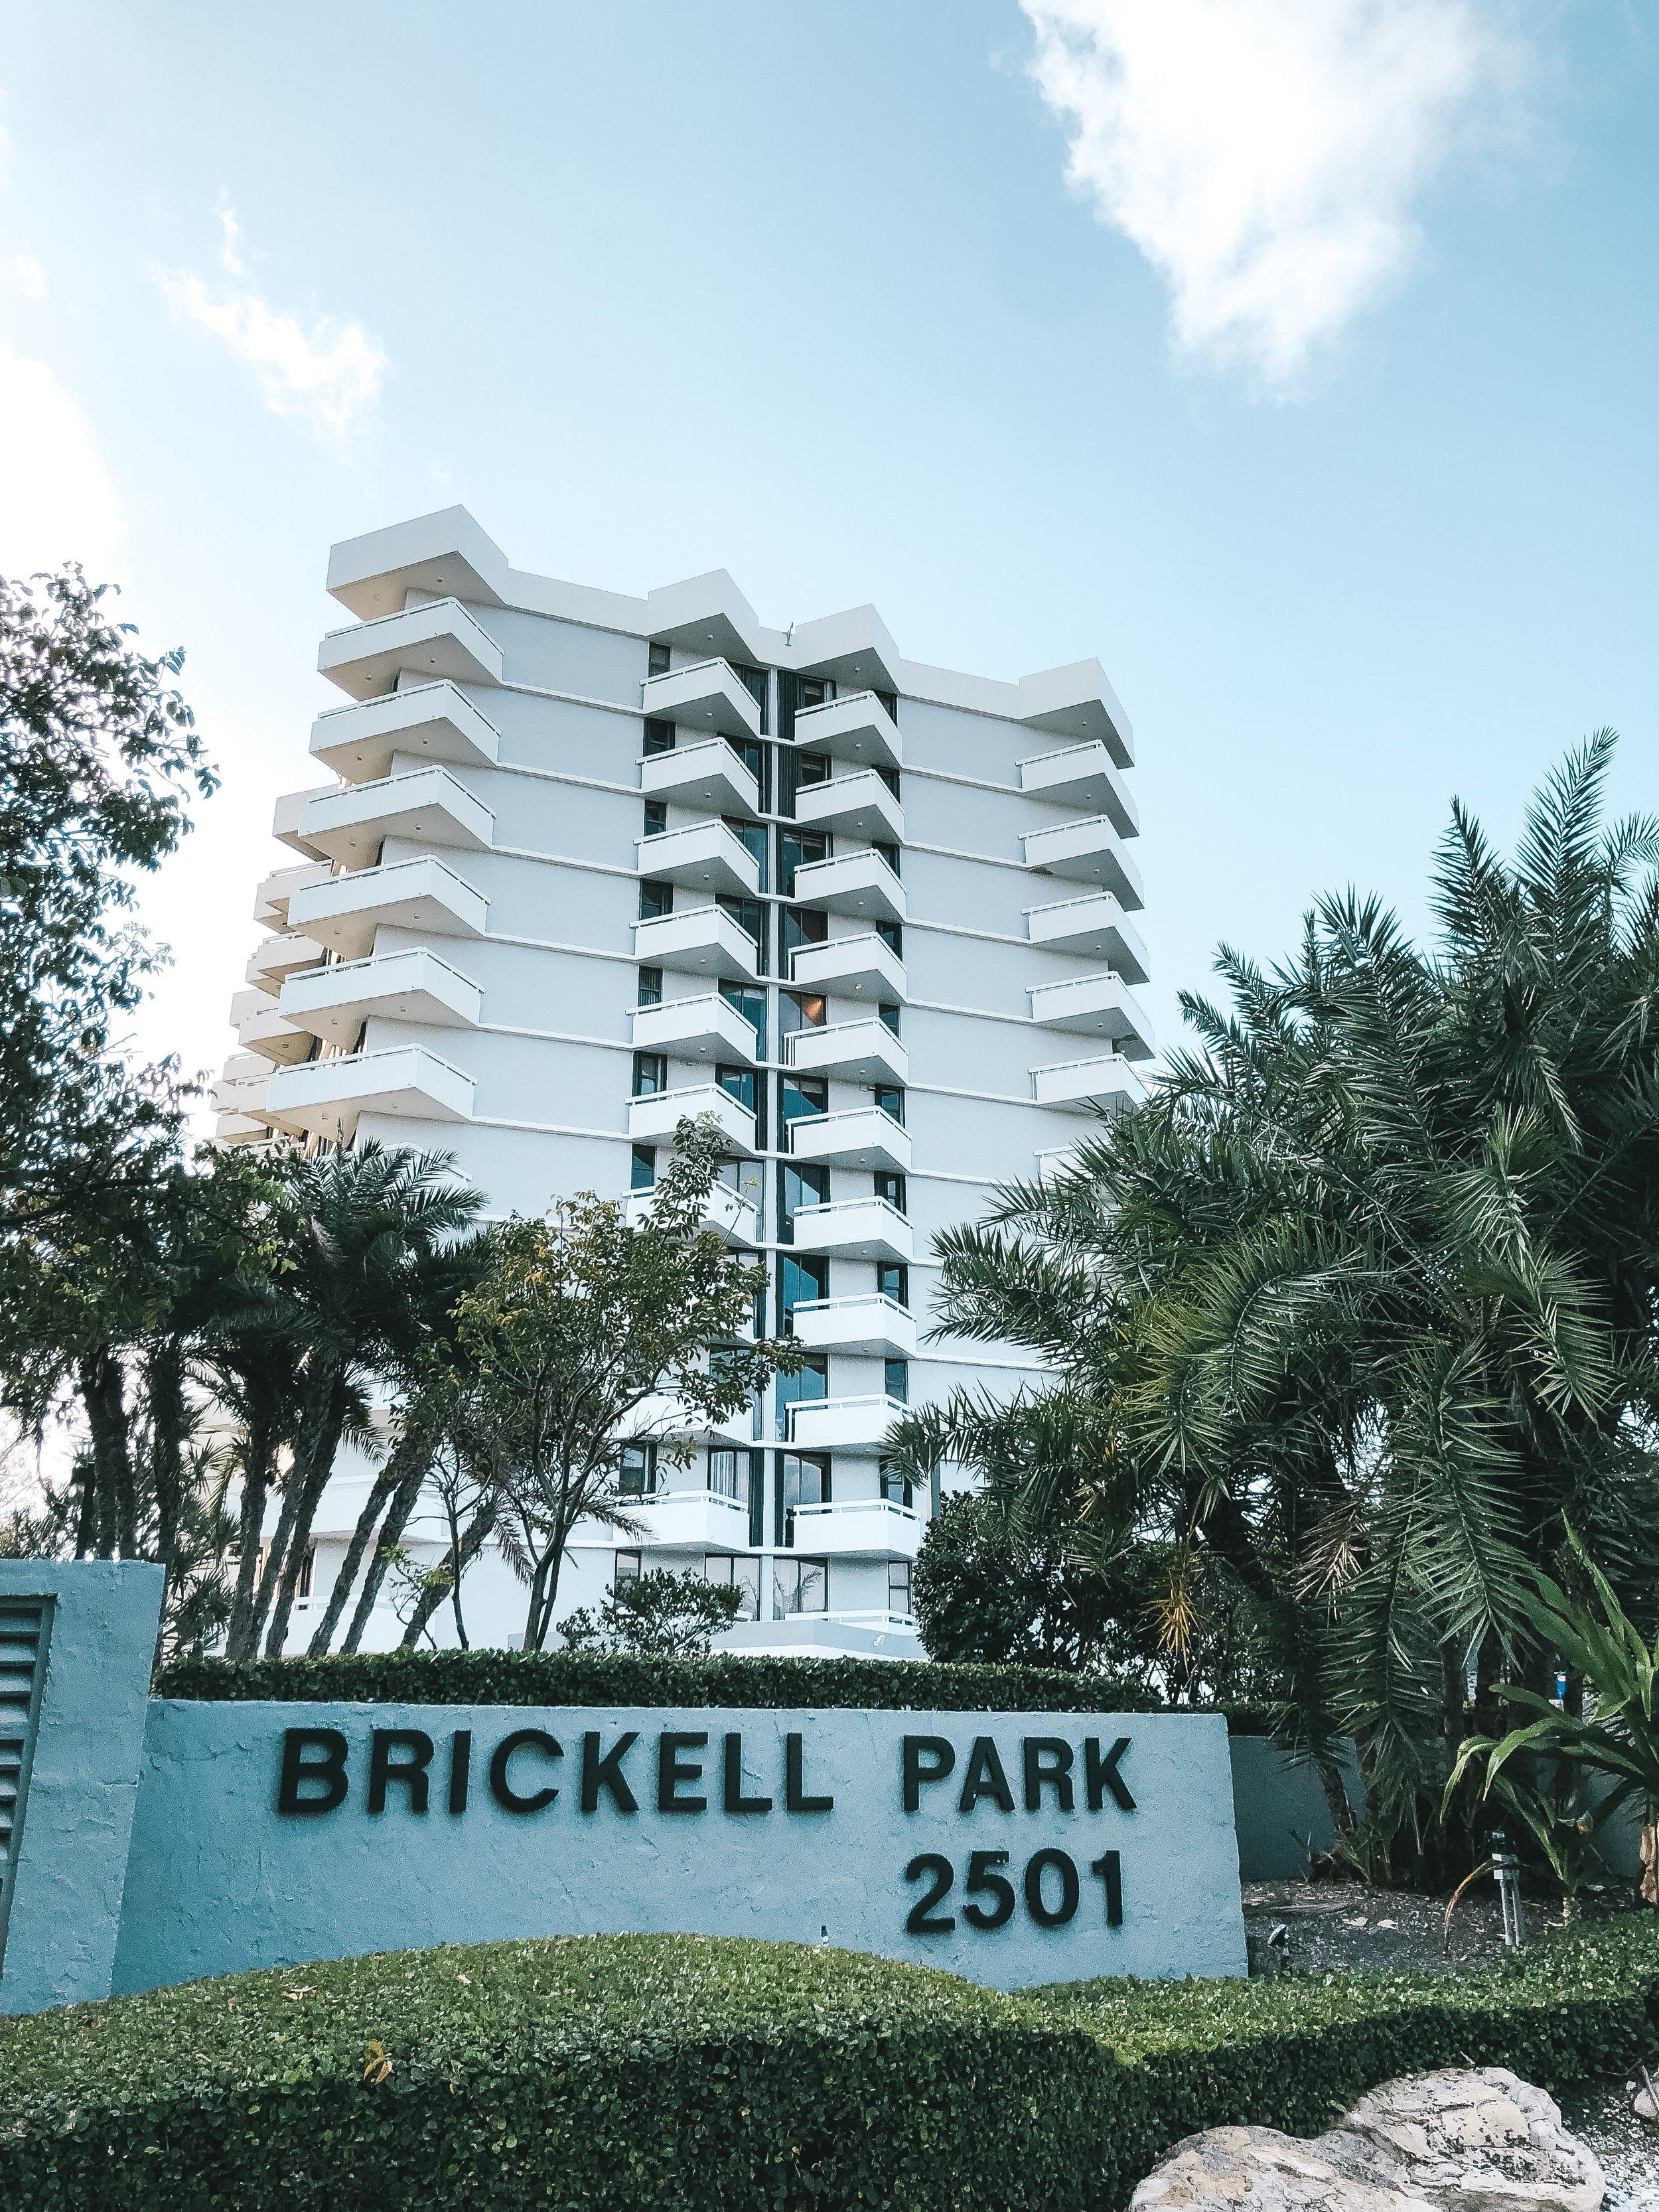 Brickell Park - Address: 2501 Brickell Avenue, Miami, FL 33129Number of Units: 99Info: Gloria Blasini, President | Dorys Fermin, Manager